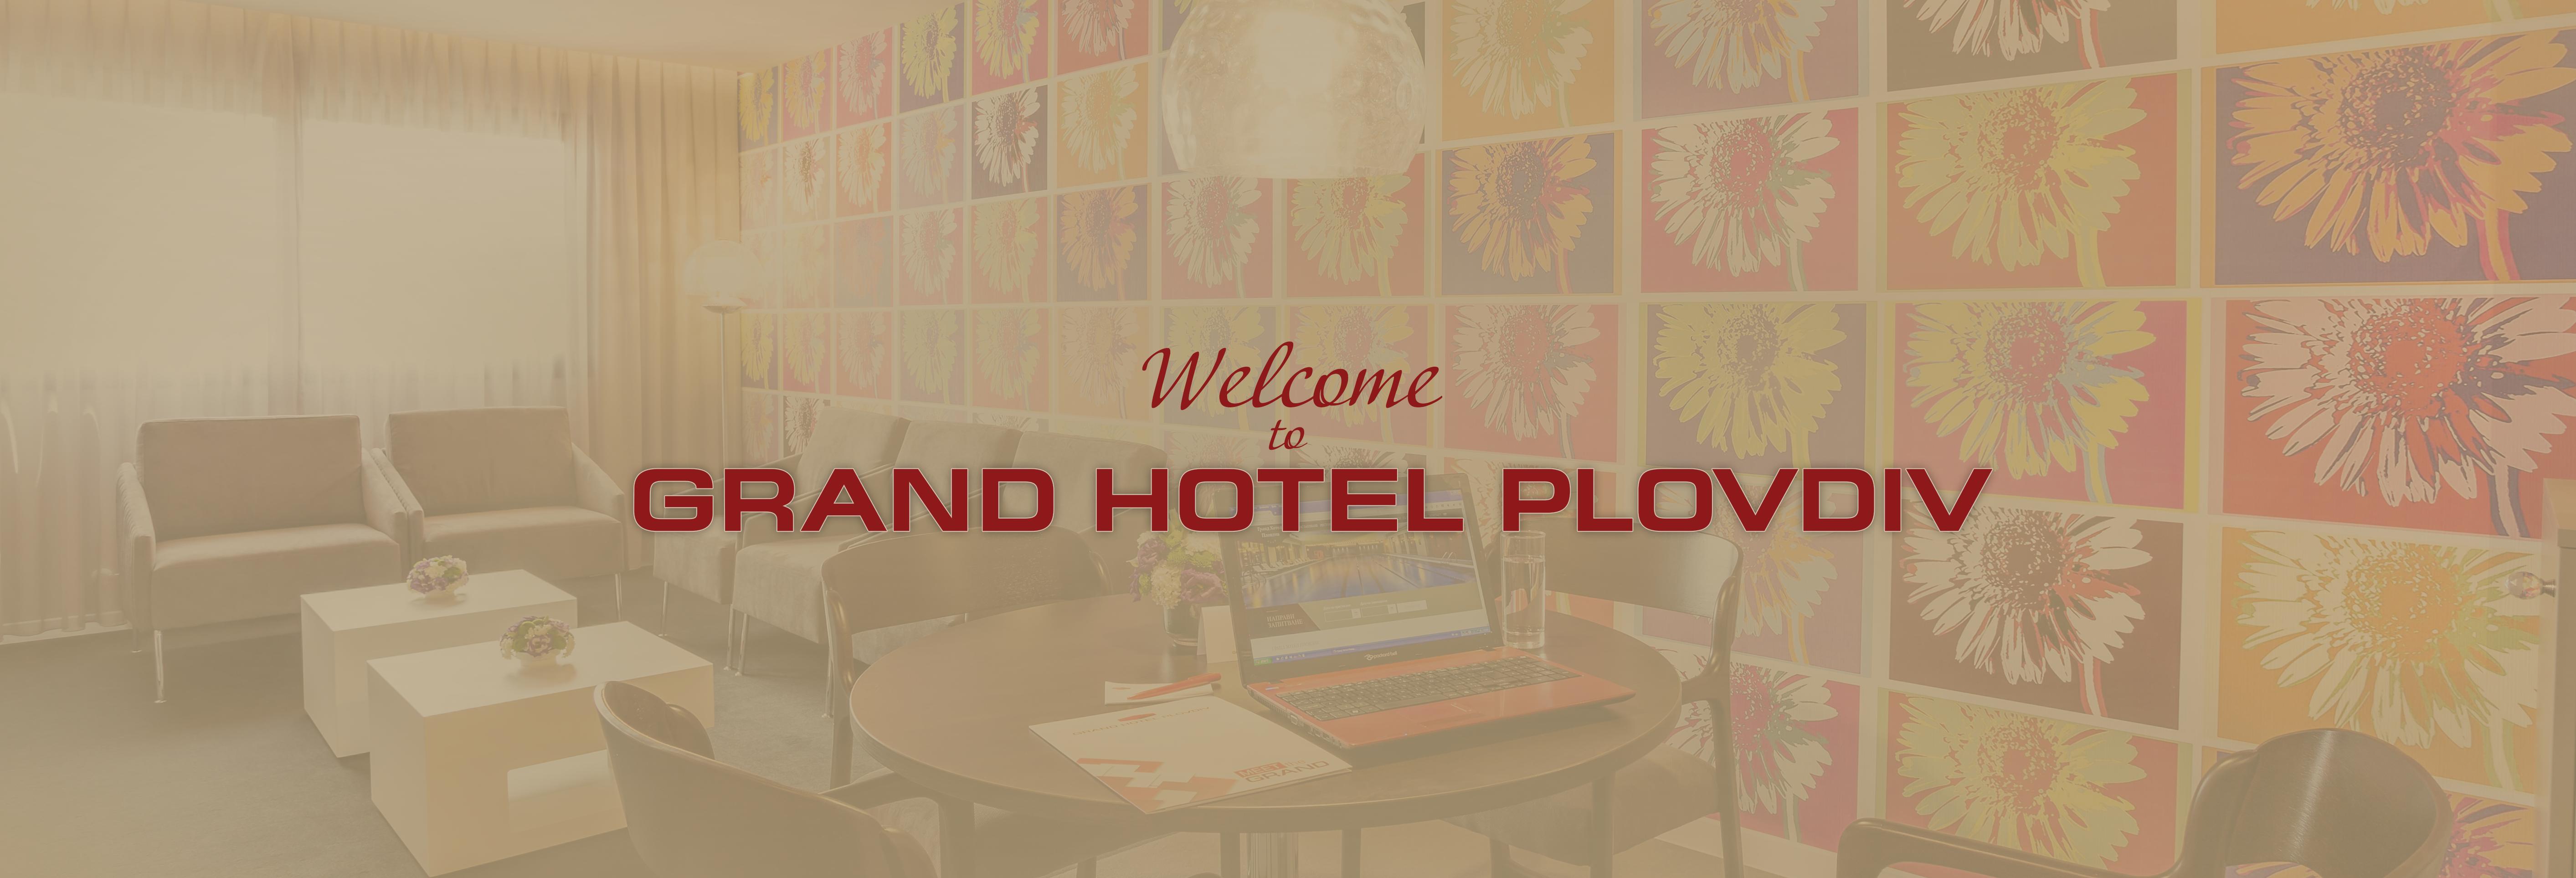 site-top-grandhotel